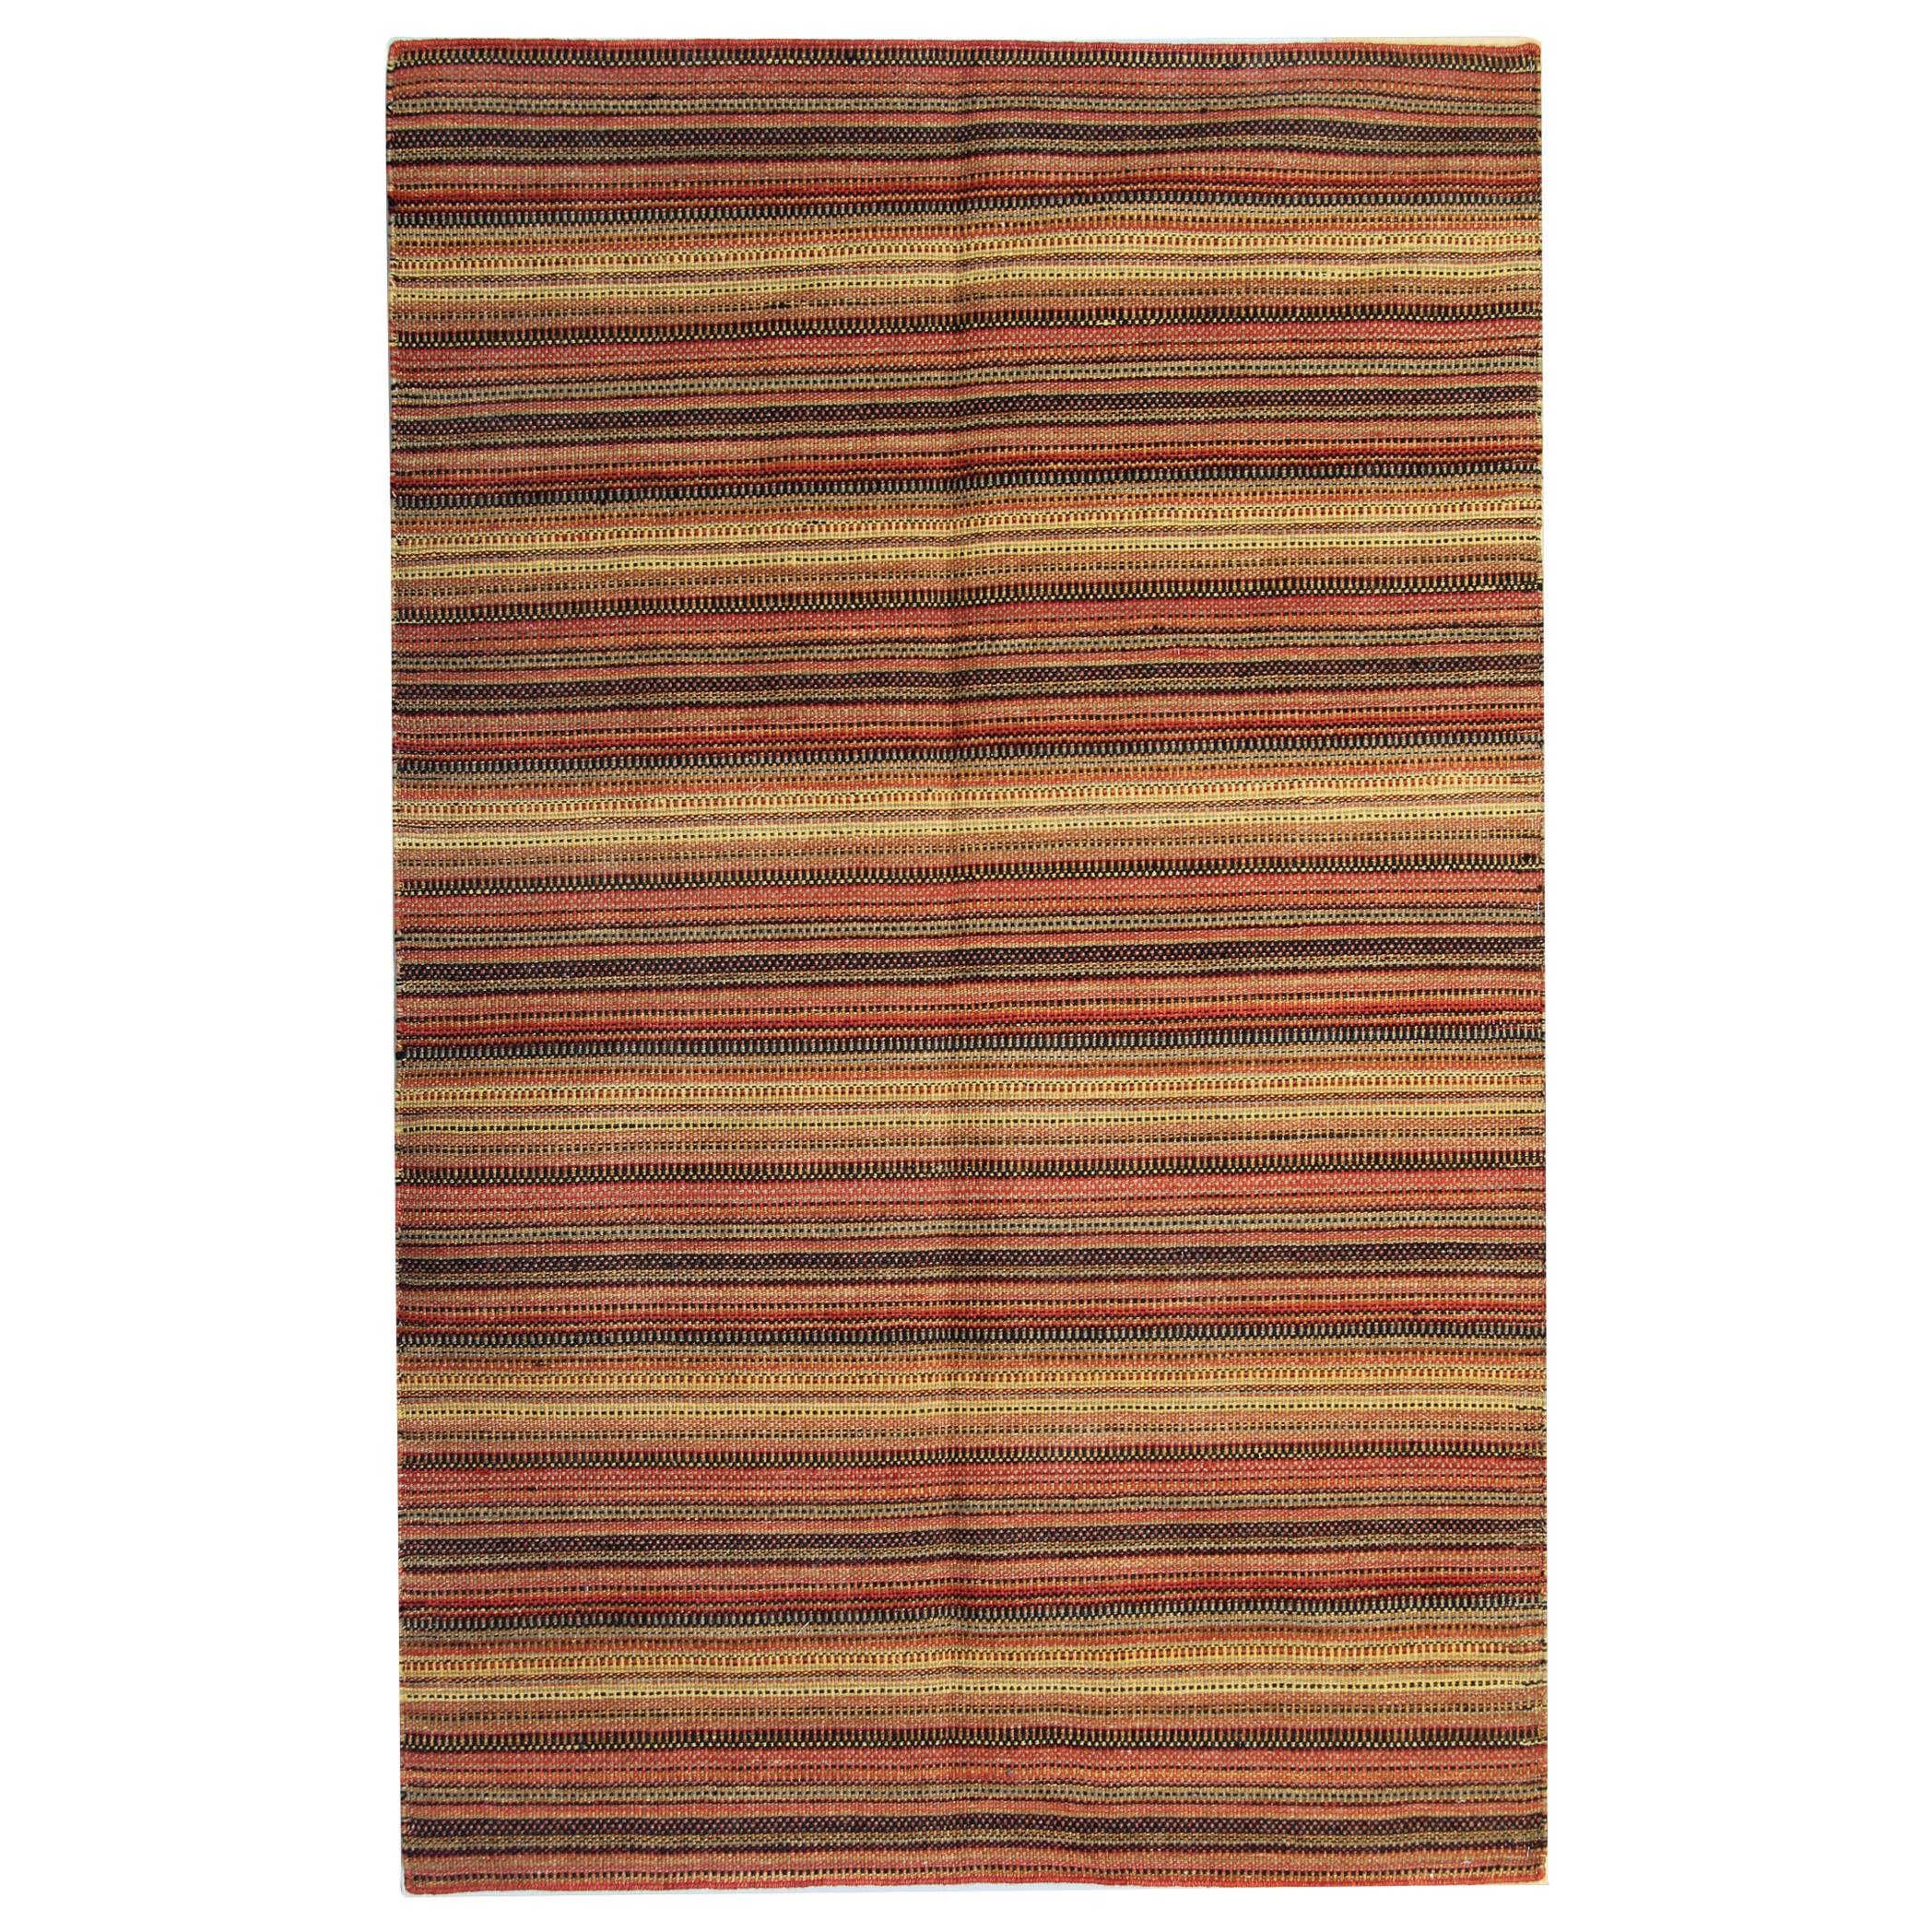 Modern Striped Kilim Rug Transitional Area Rug, Handmade Orange Kilims for Sale